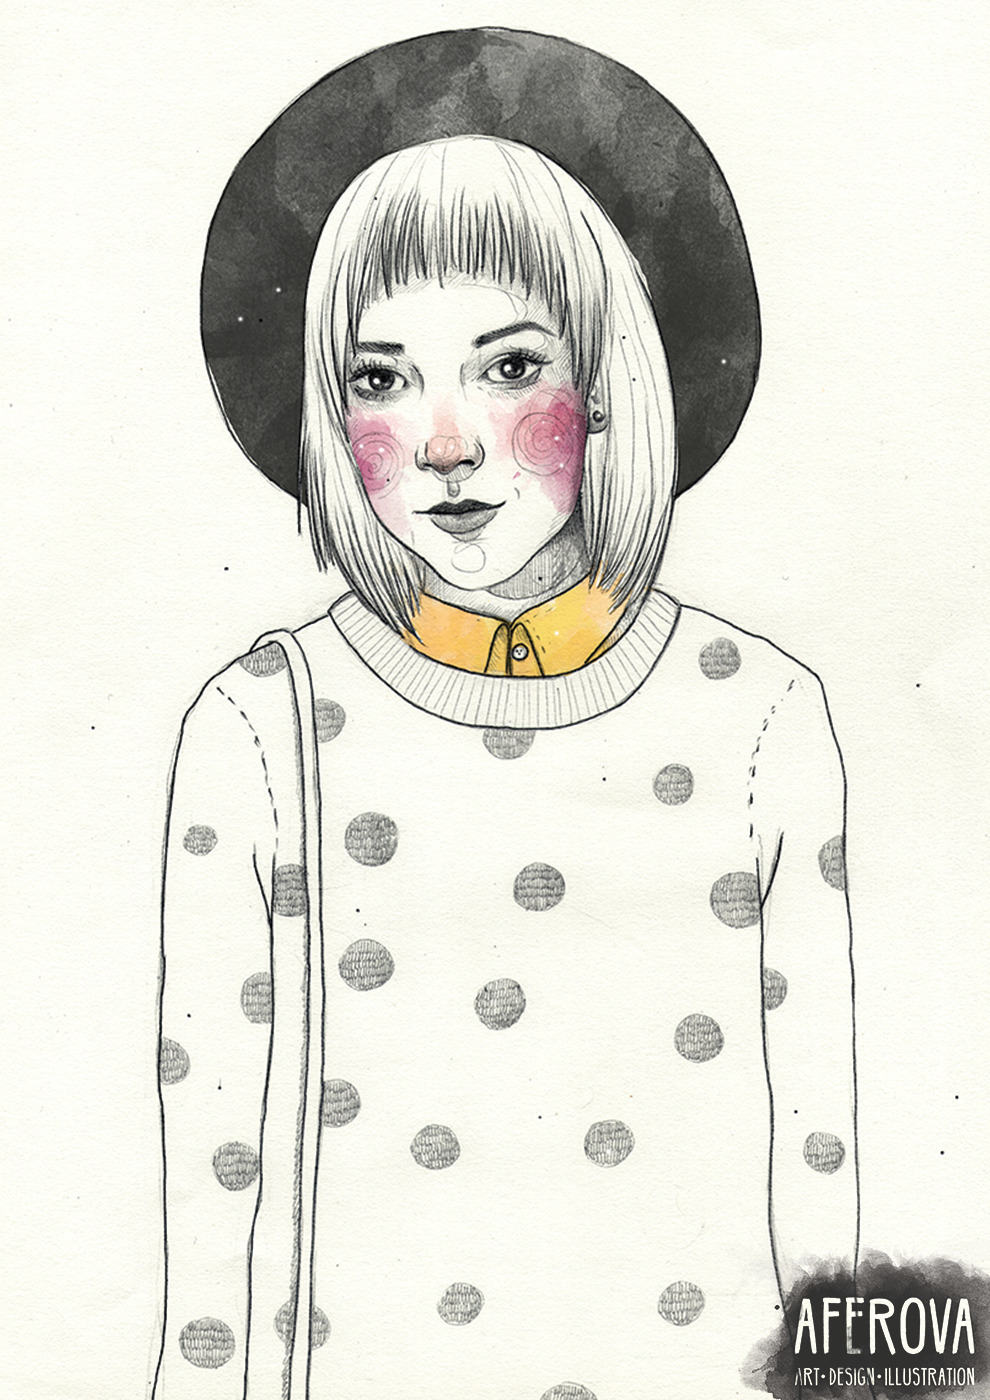 Julia - illustration, drawing, portrait - aferova   ello